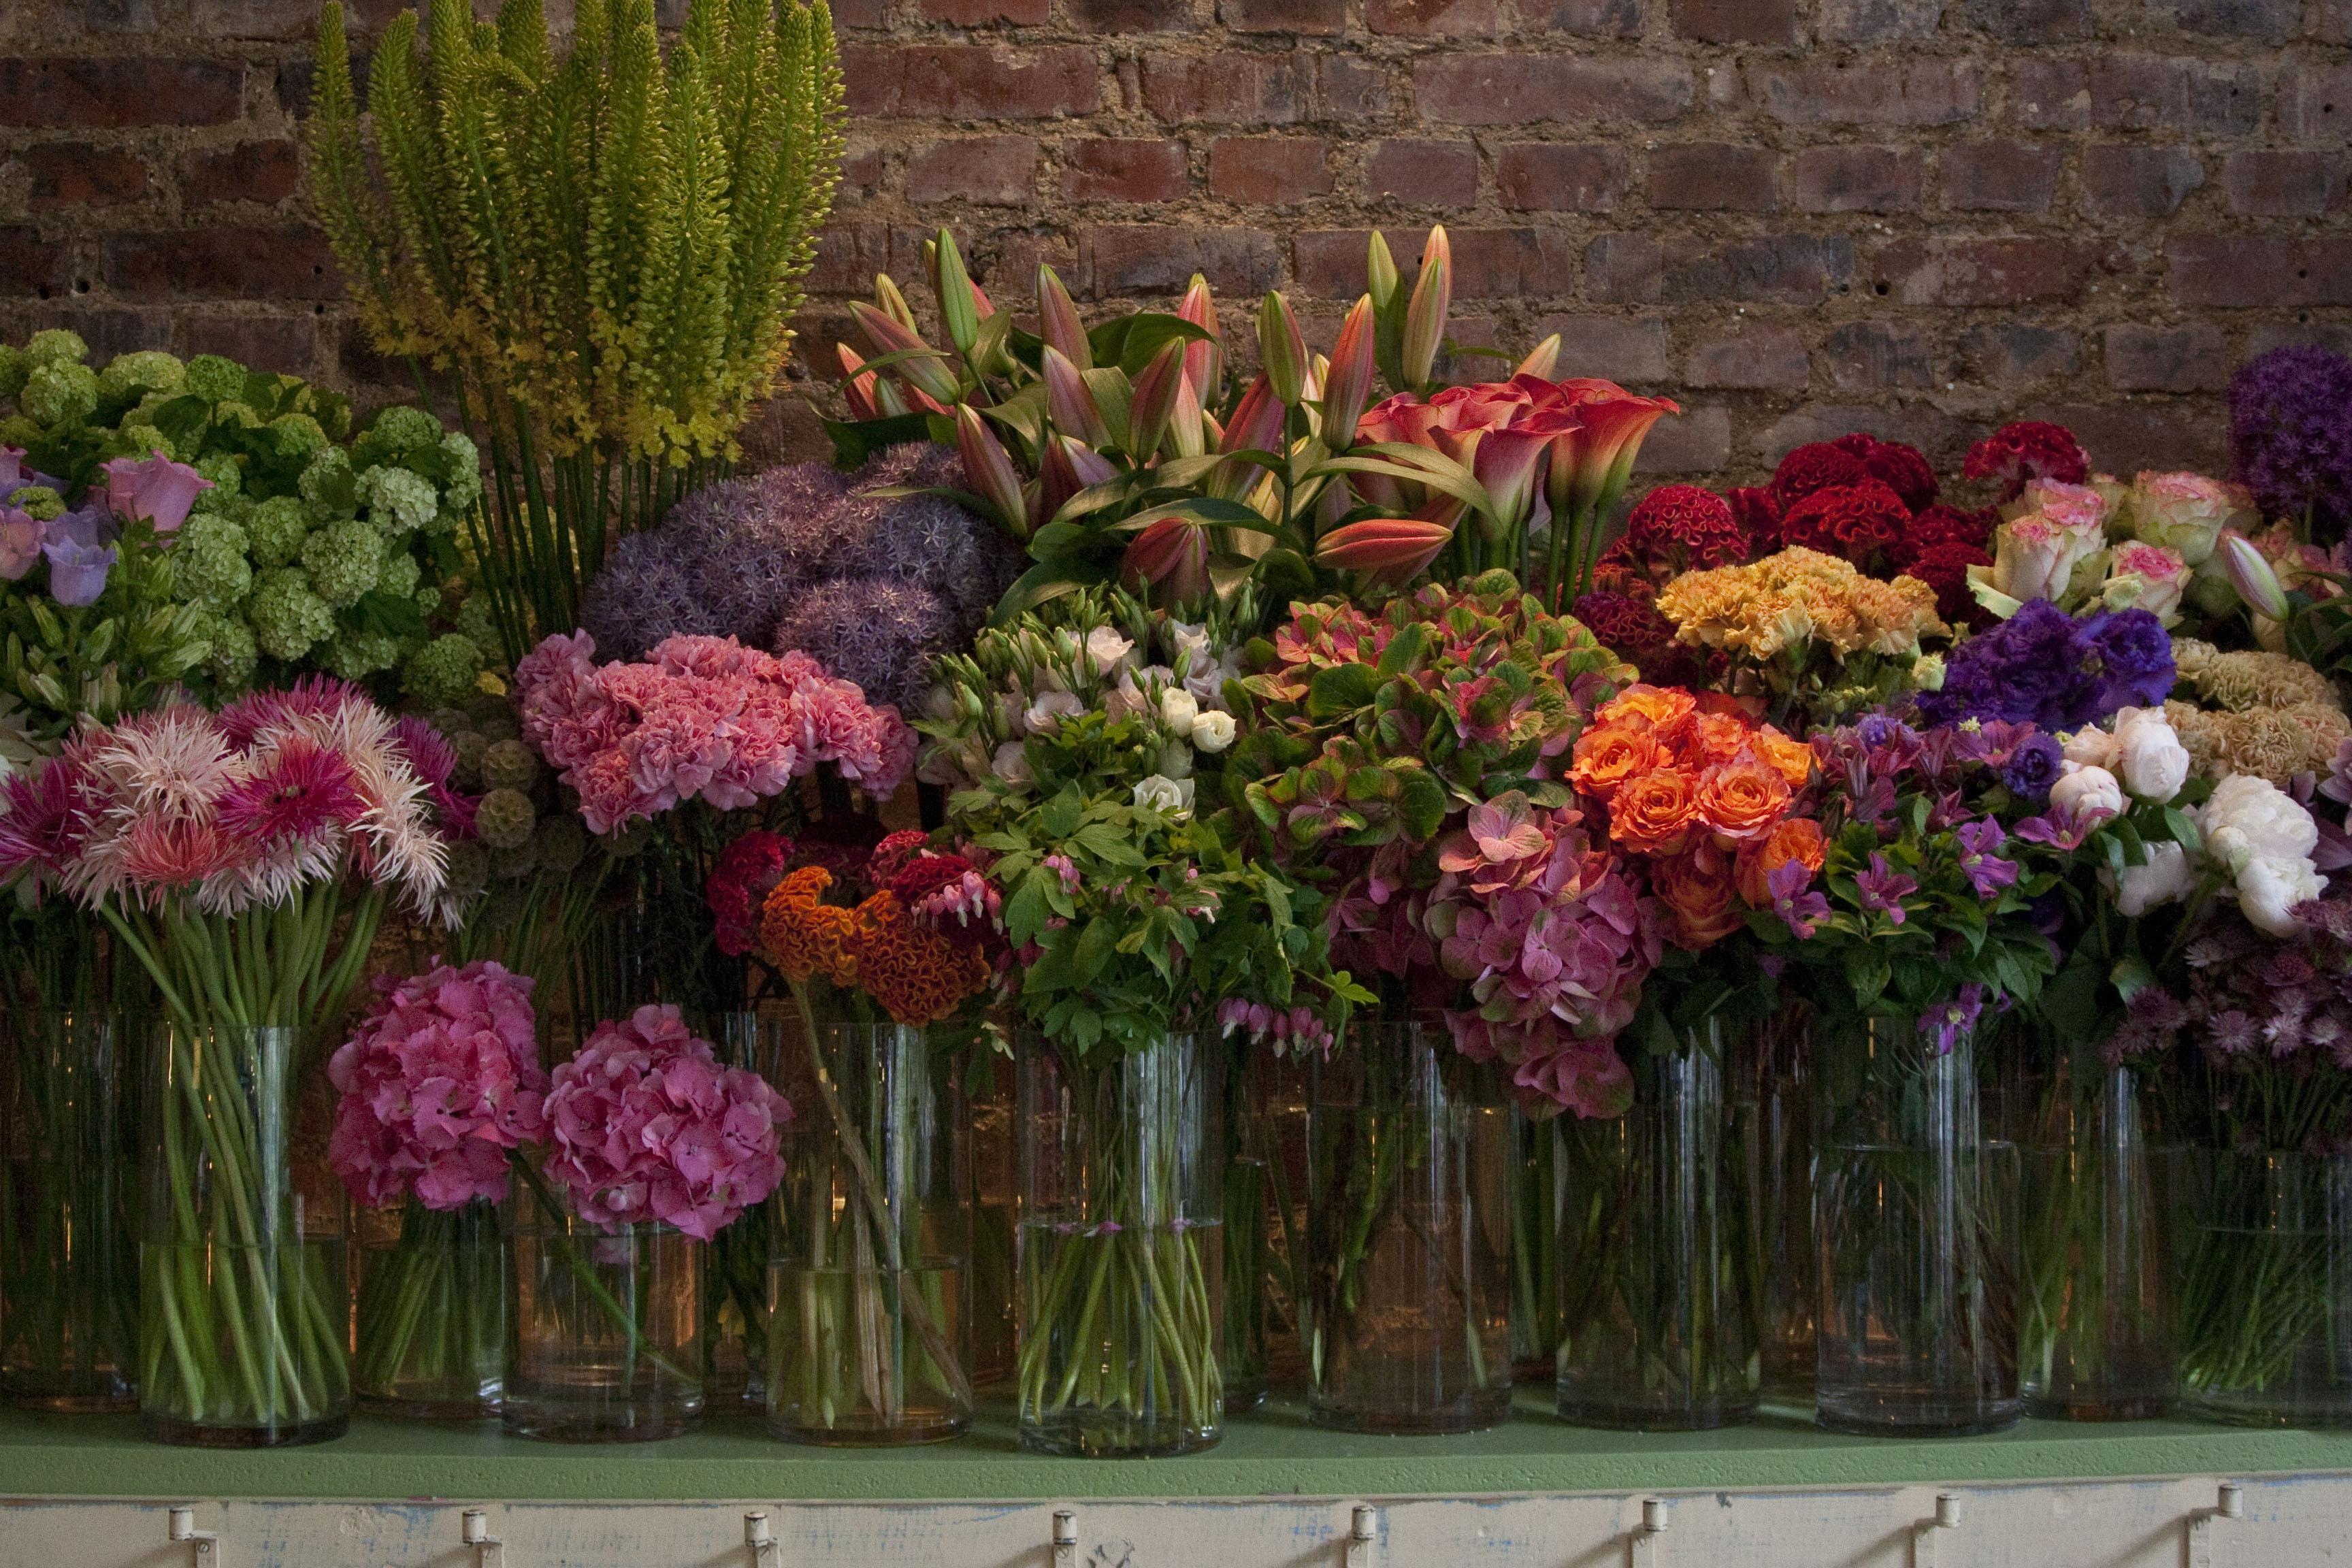 Blumenladen in Town